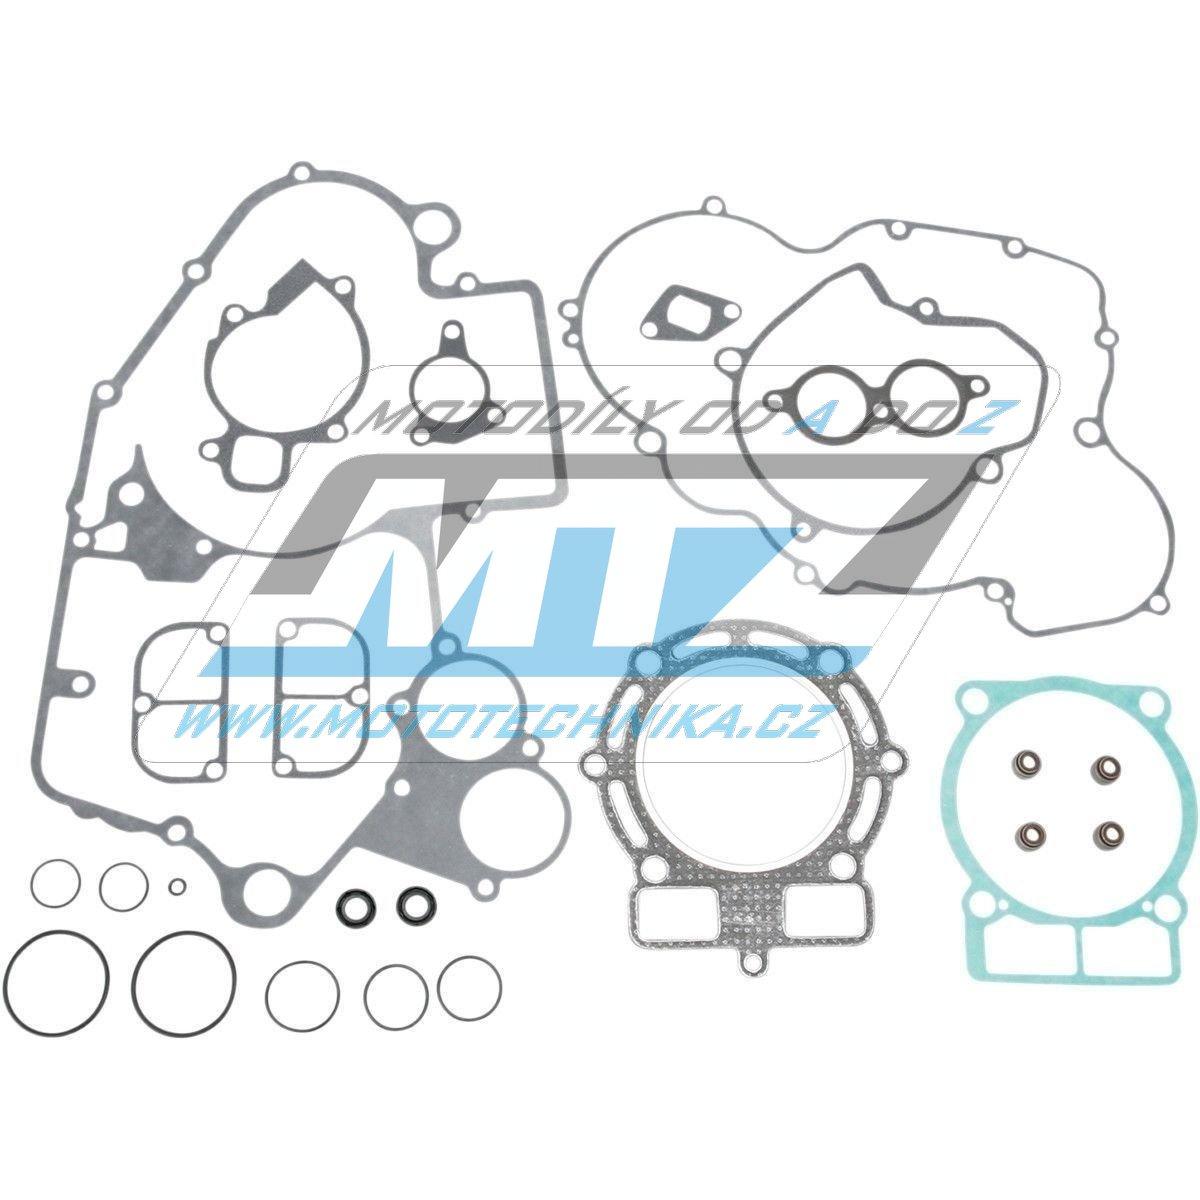 Tesnenie kompletný motor KTM400+KTM450 EXC / 00-07 + Beta RR400+Beta450 / 05-09 MTZ